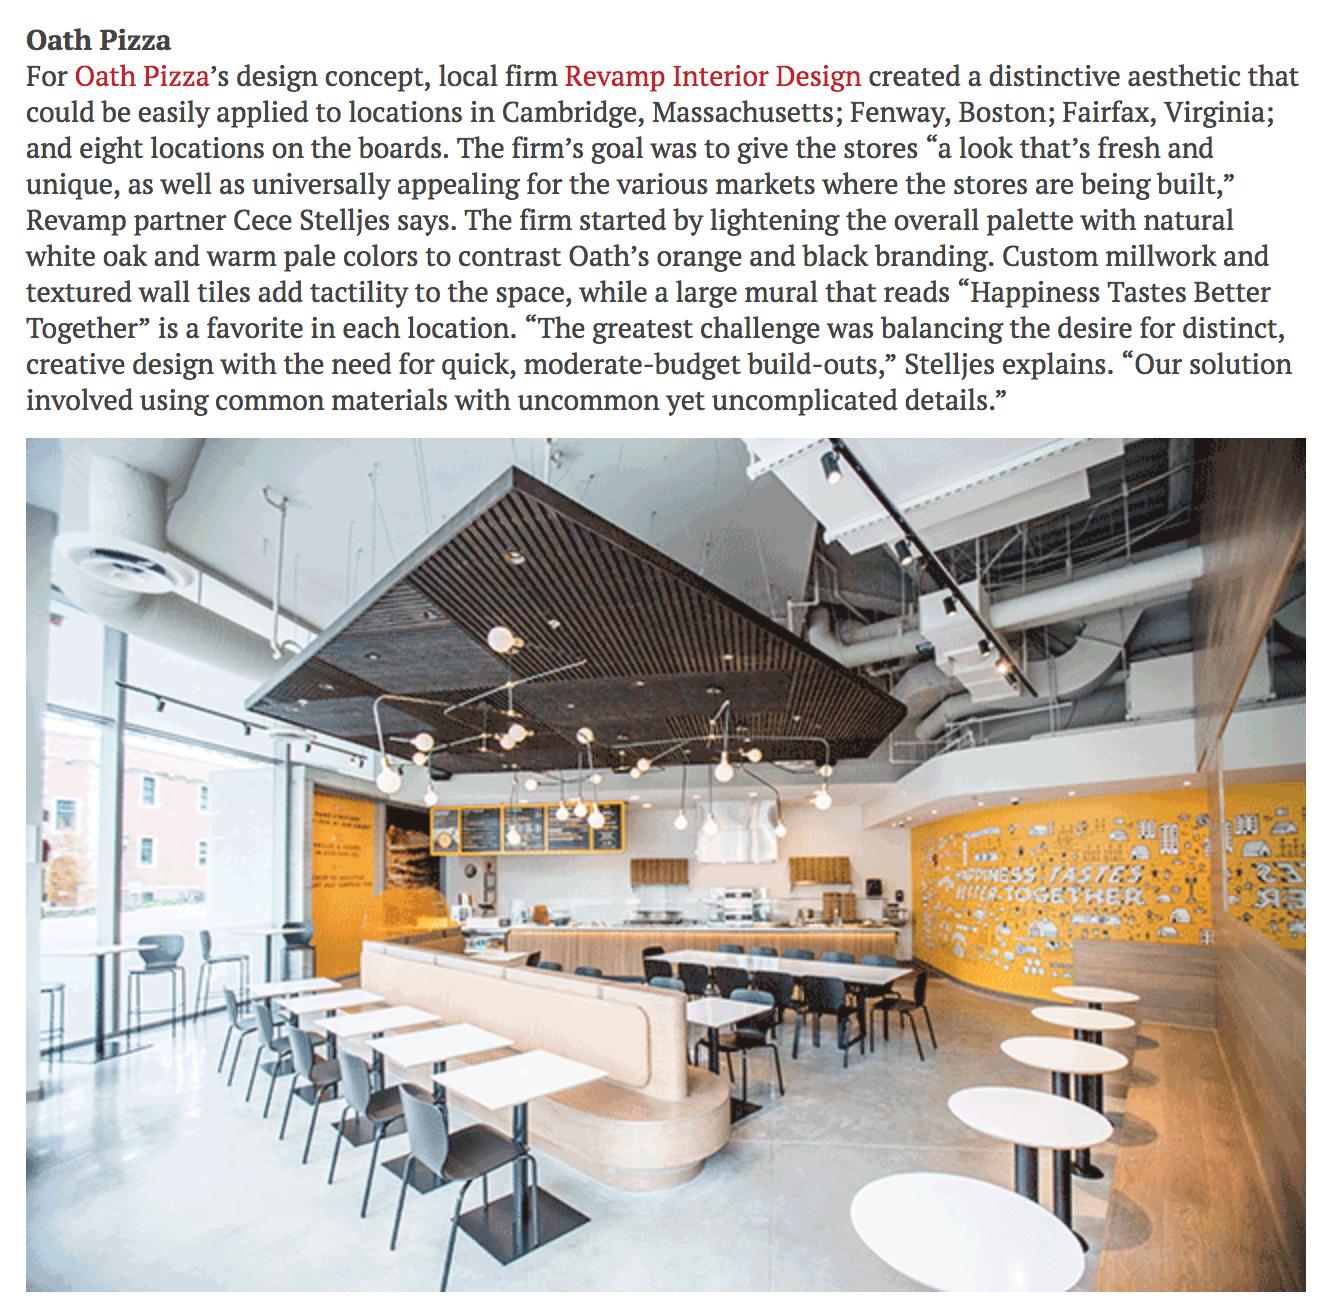 Hospitality Design - Oath Pizza - Screenshot.png